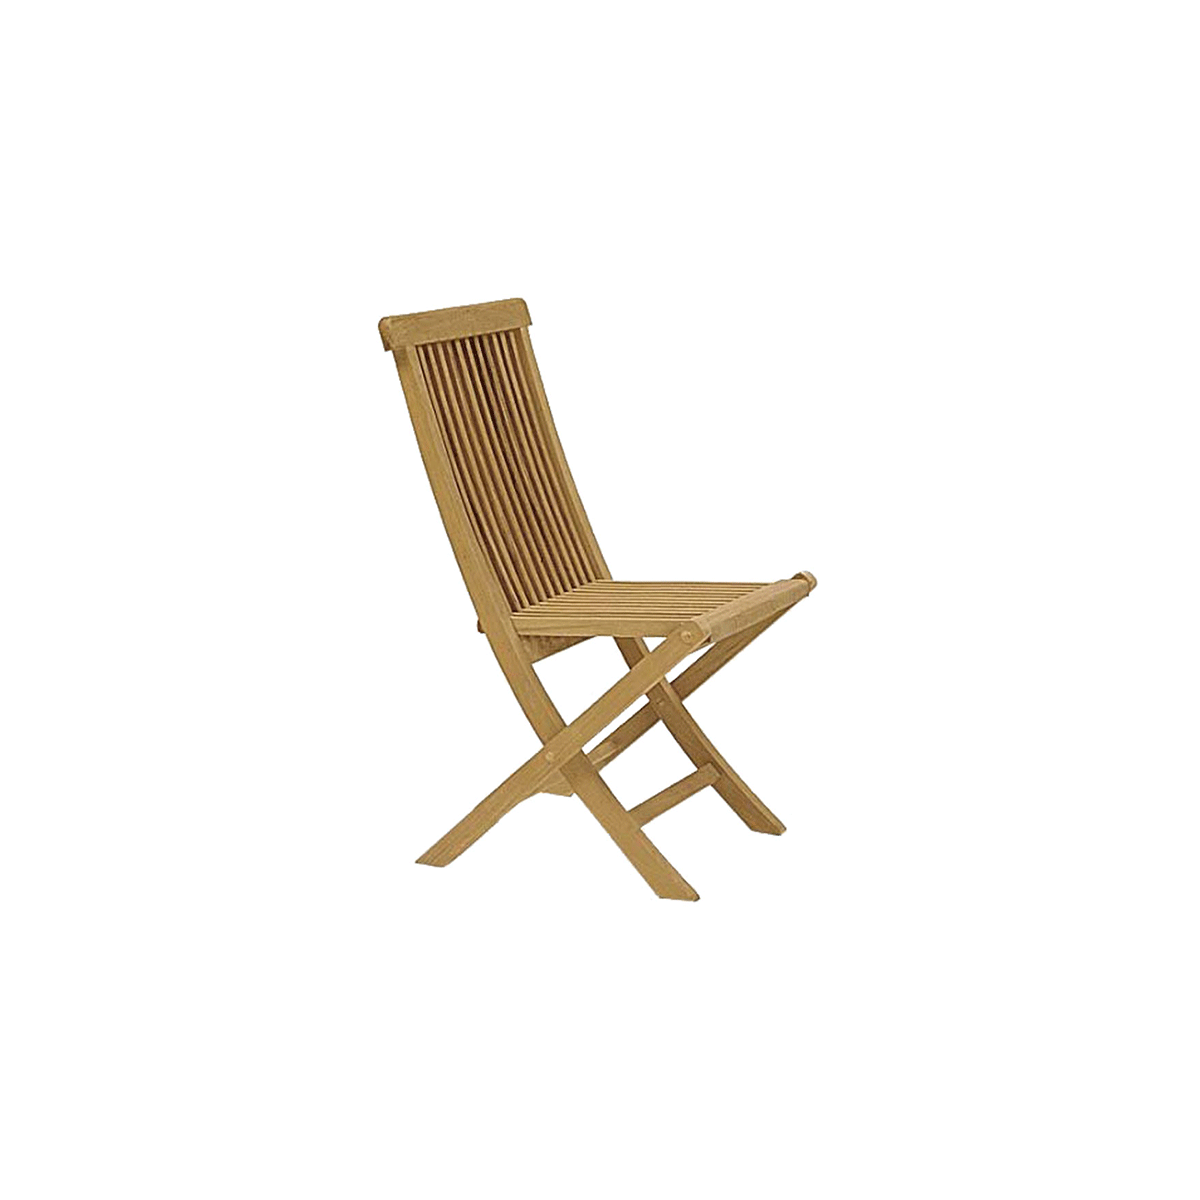 Gartenmobel Alu Ikea : Gartenmöbel Teak Set Cornwall  günstiges TeakSet